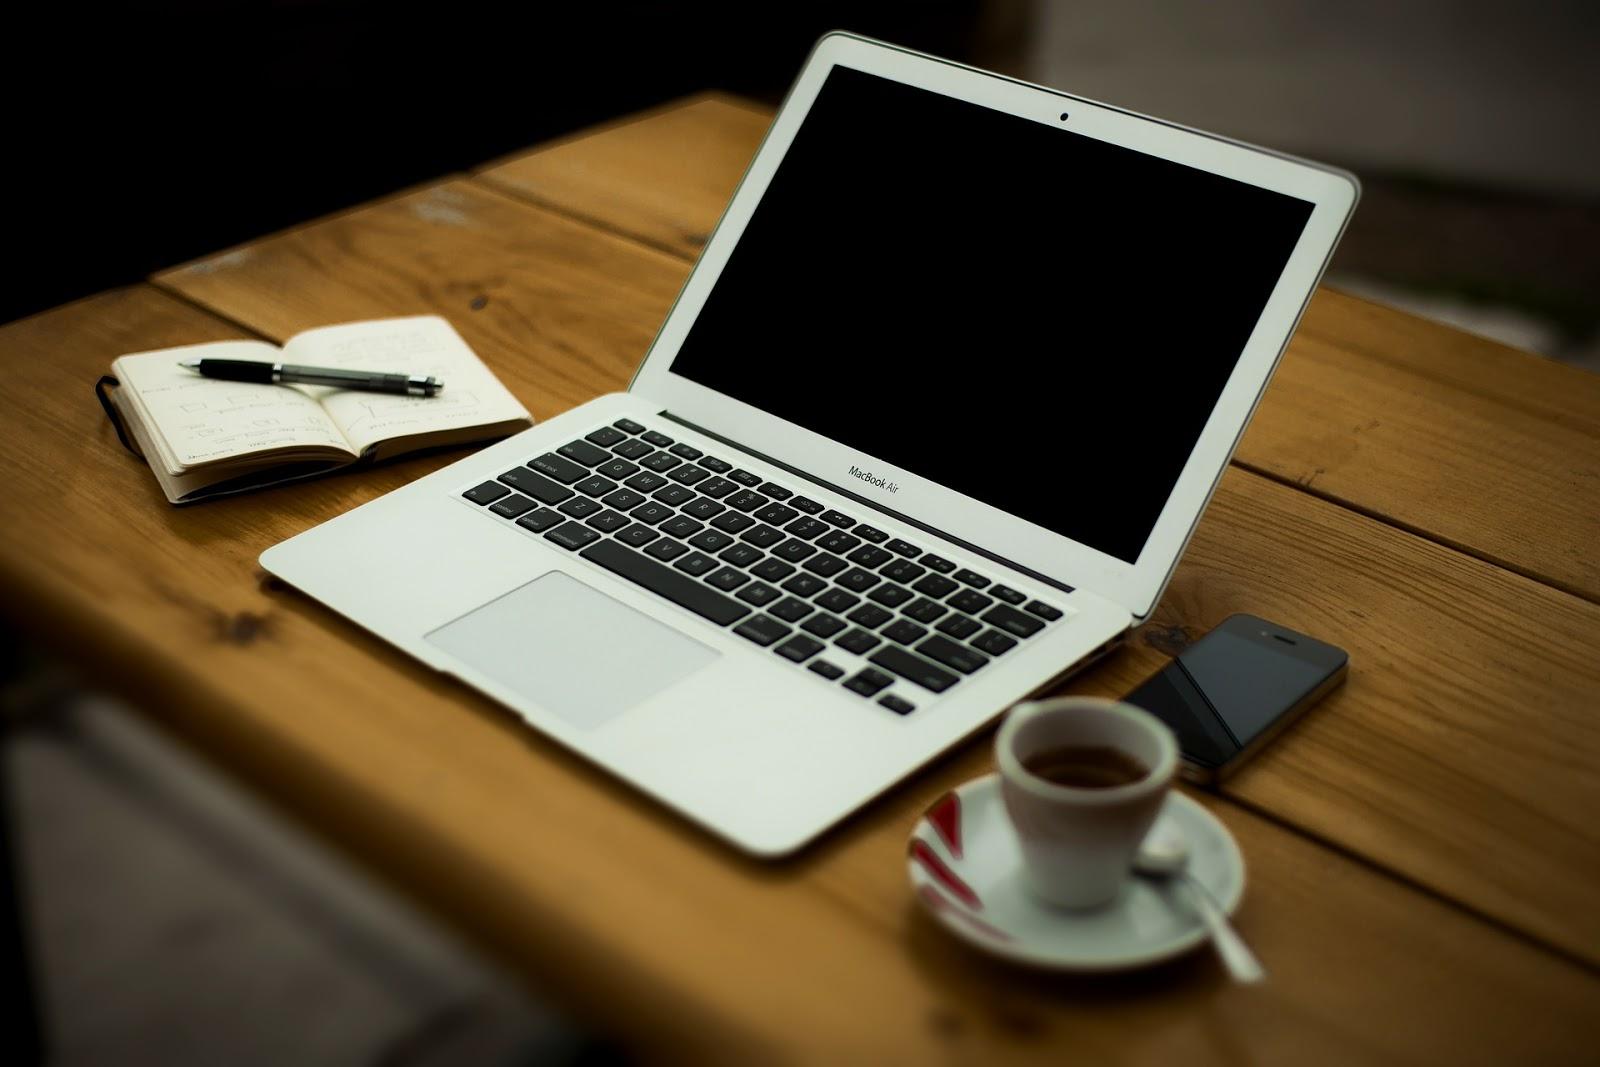 lavori online da casa sicuri kenya